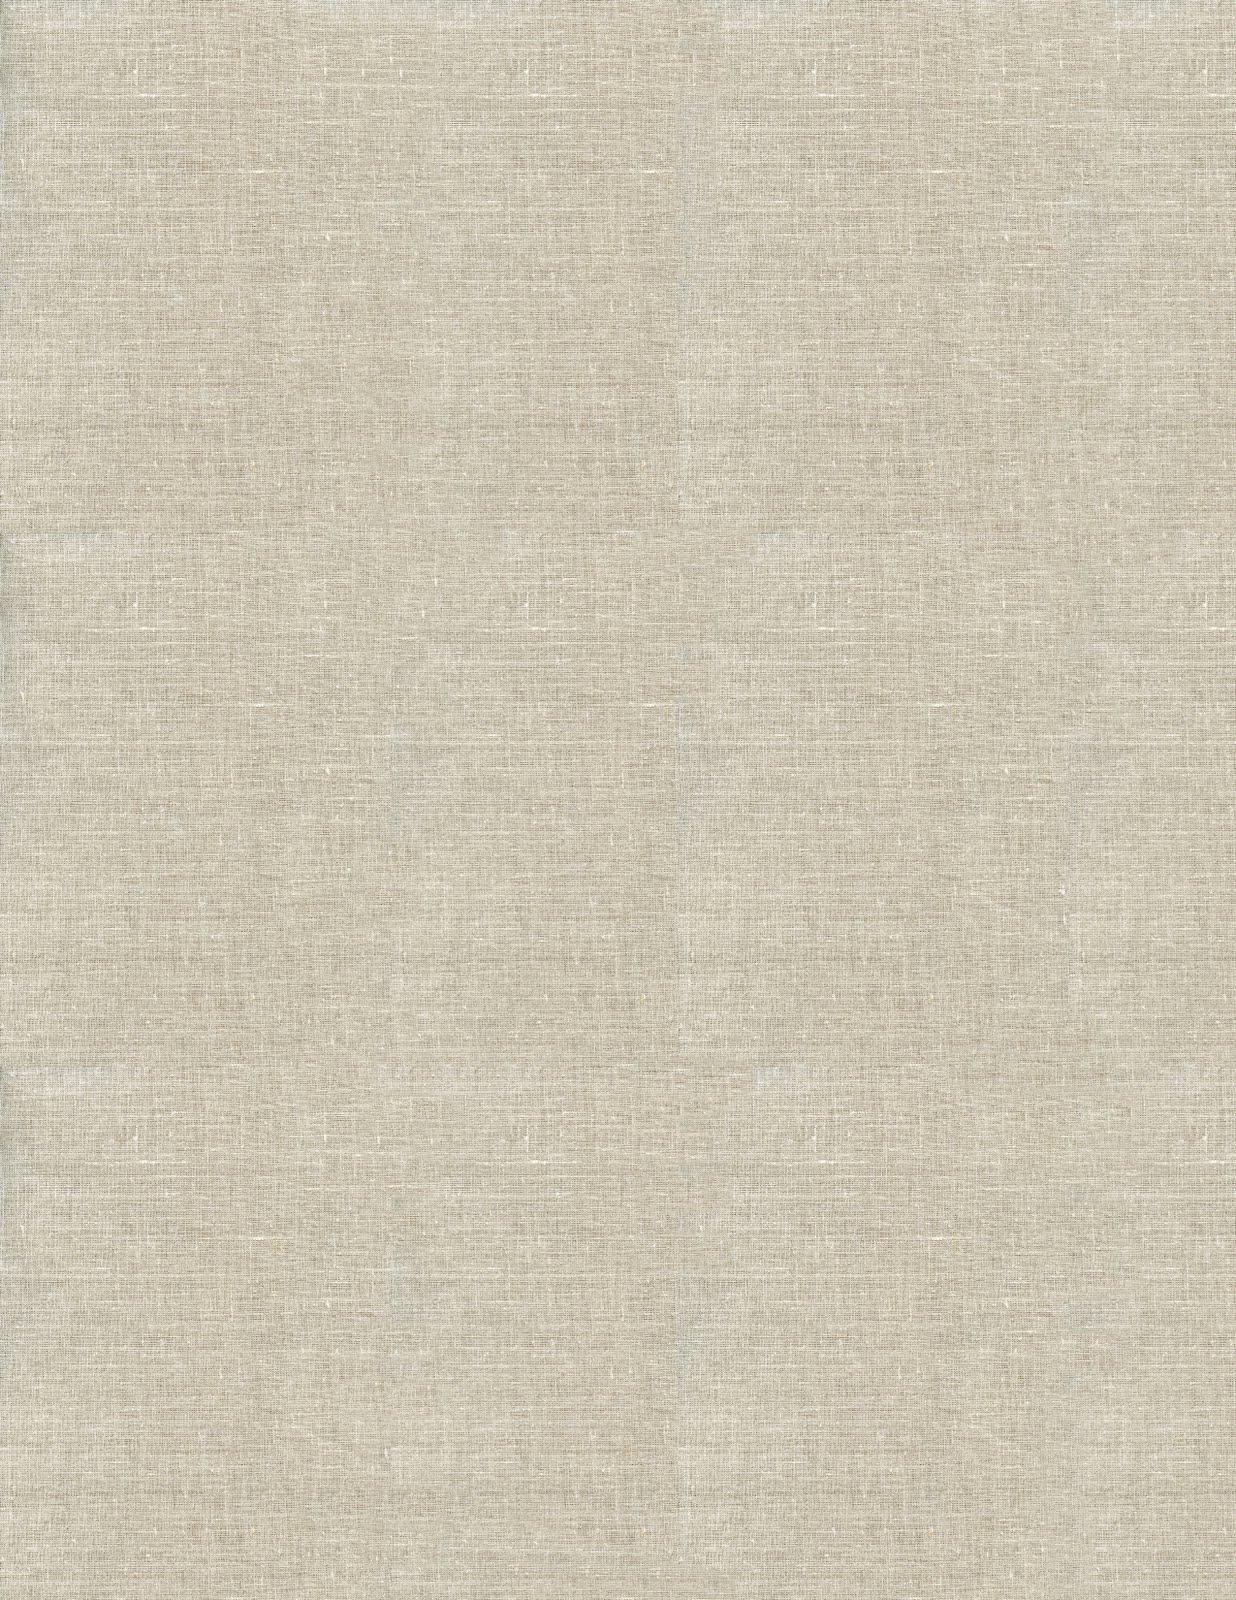 white linen paper background - photo #19